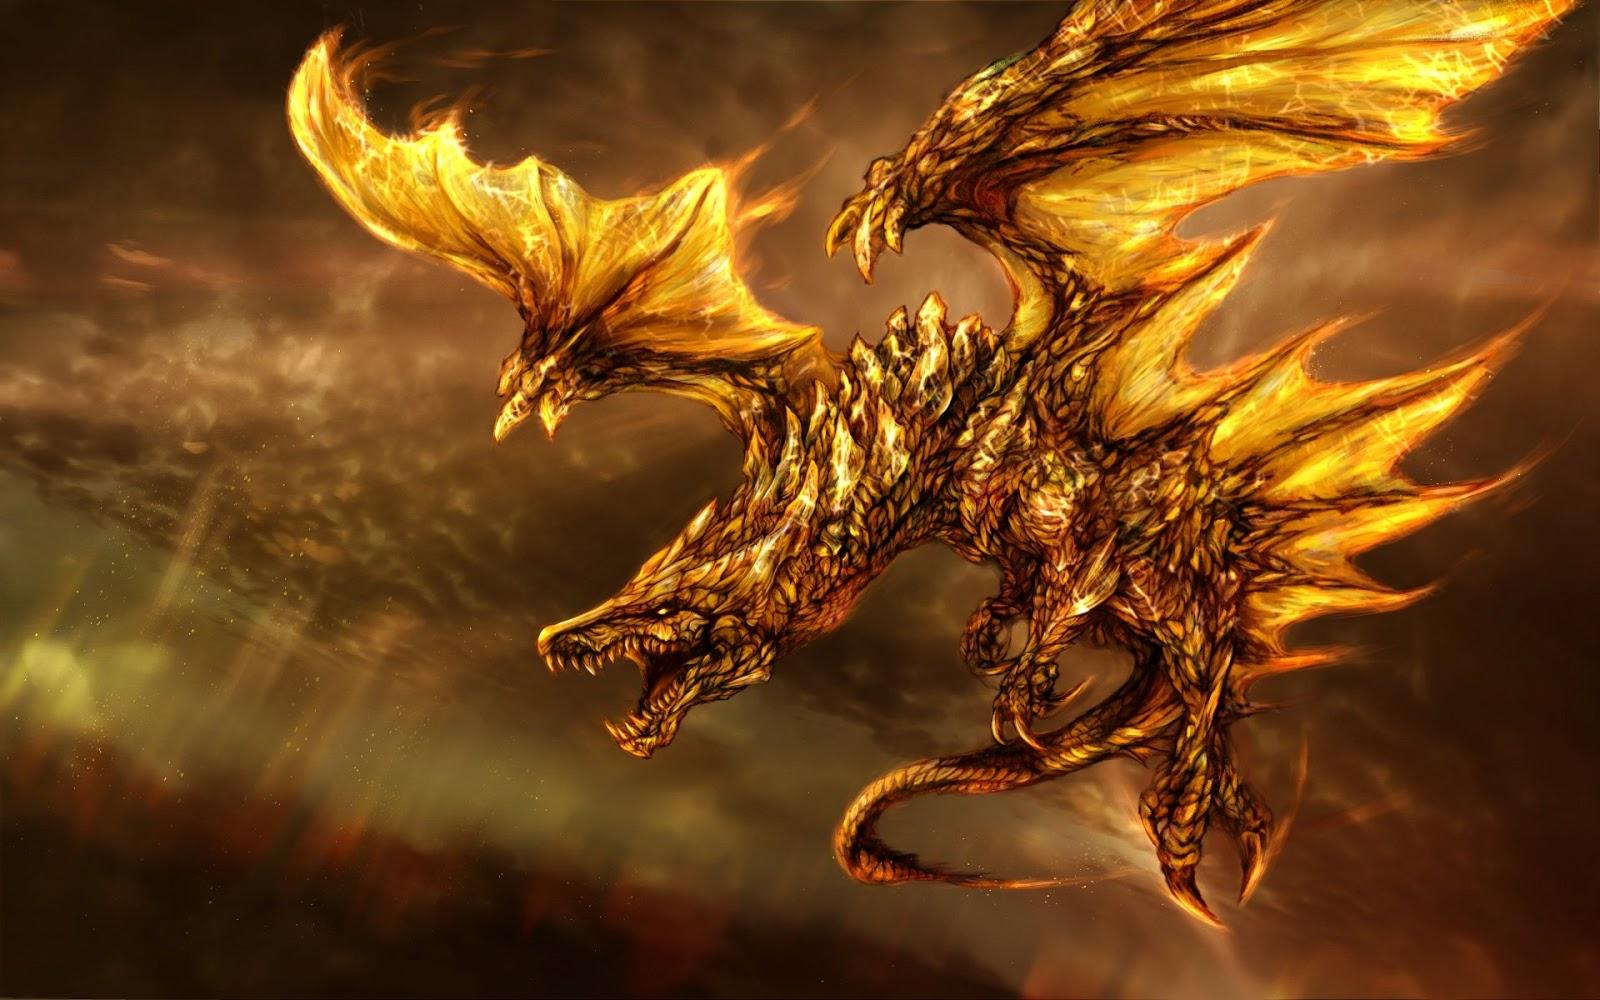 Cool Wallpaper High Quality Dragon - Dragon+Wallpaper+(1)  Pictures_292718.jpg